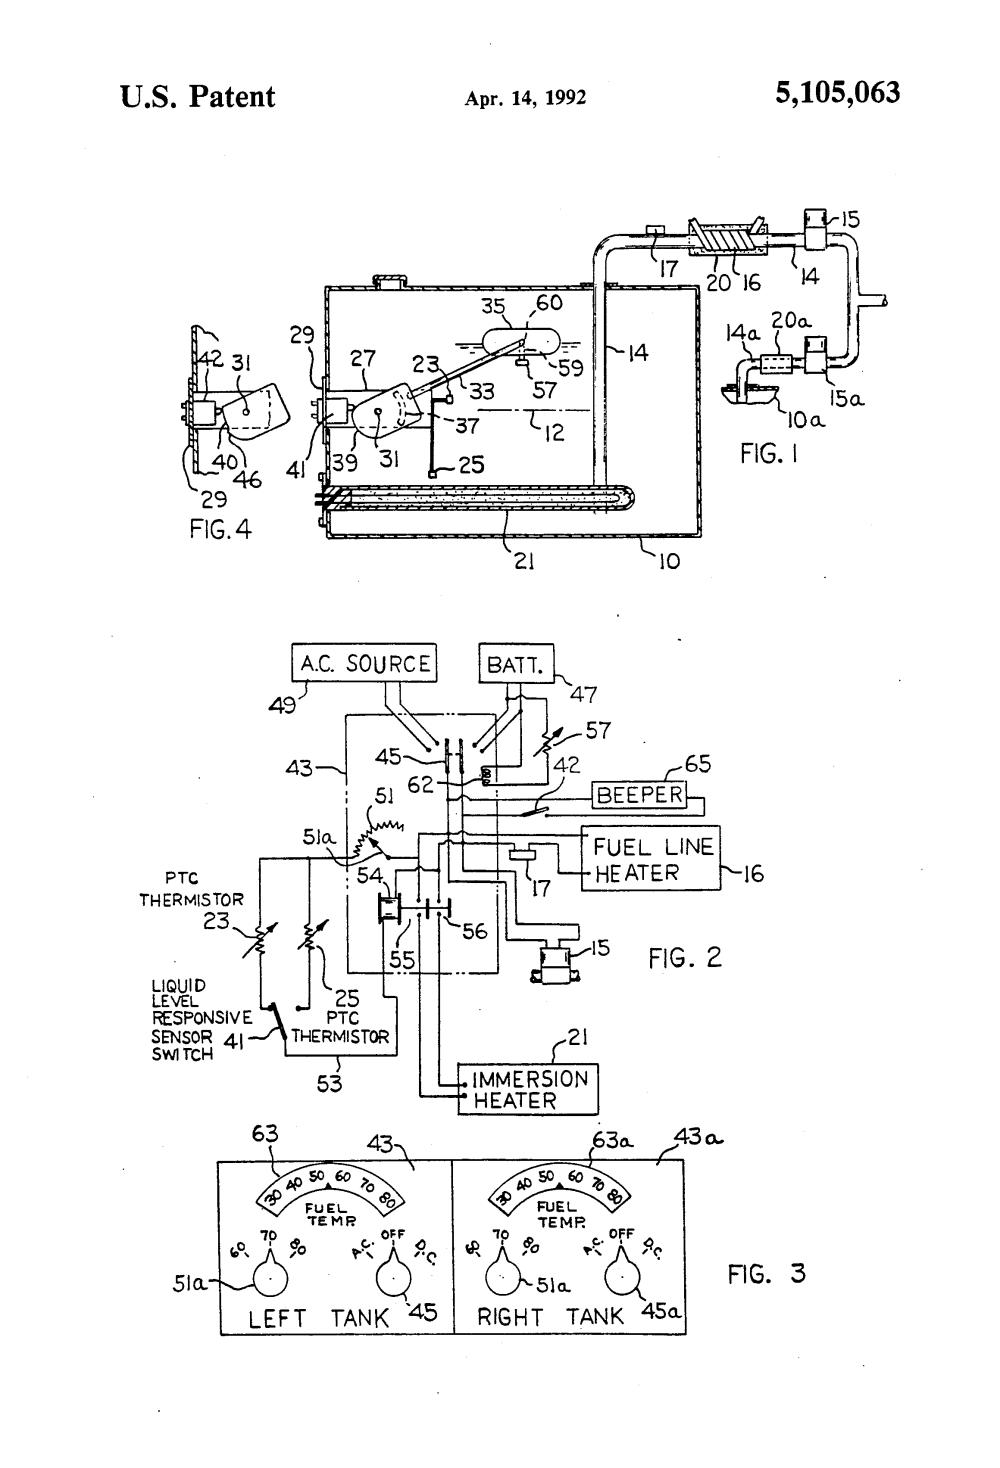 medium resolution of patent us5105063 fuel heating system utilizing a liquid level module wiring diagram thermistor fuel sending wiring diagram